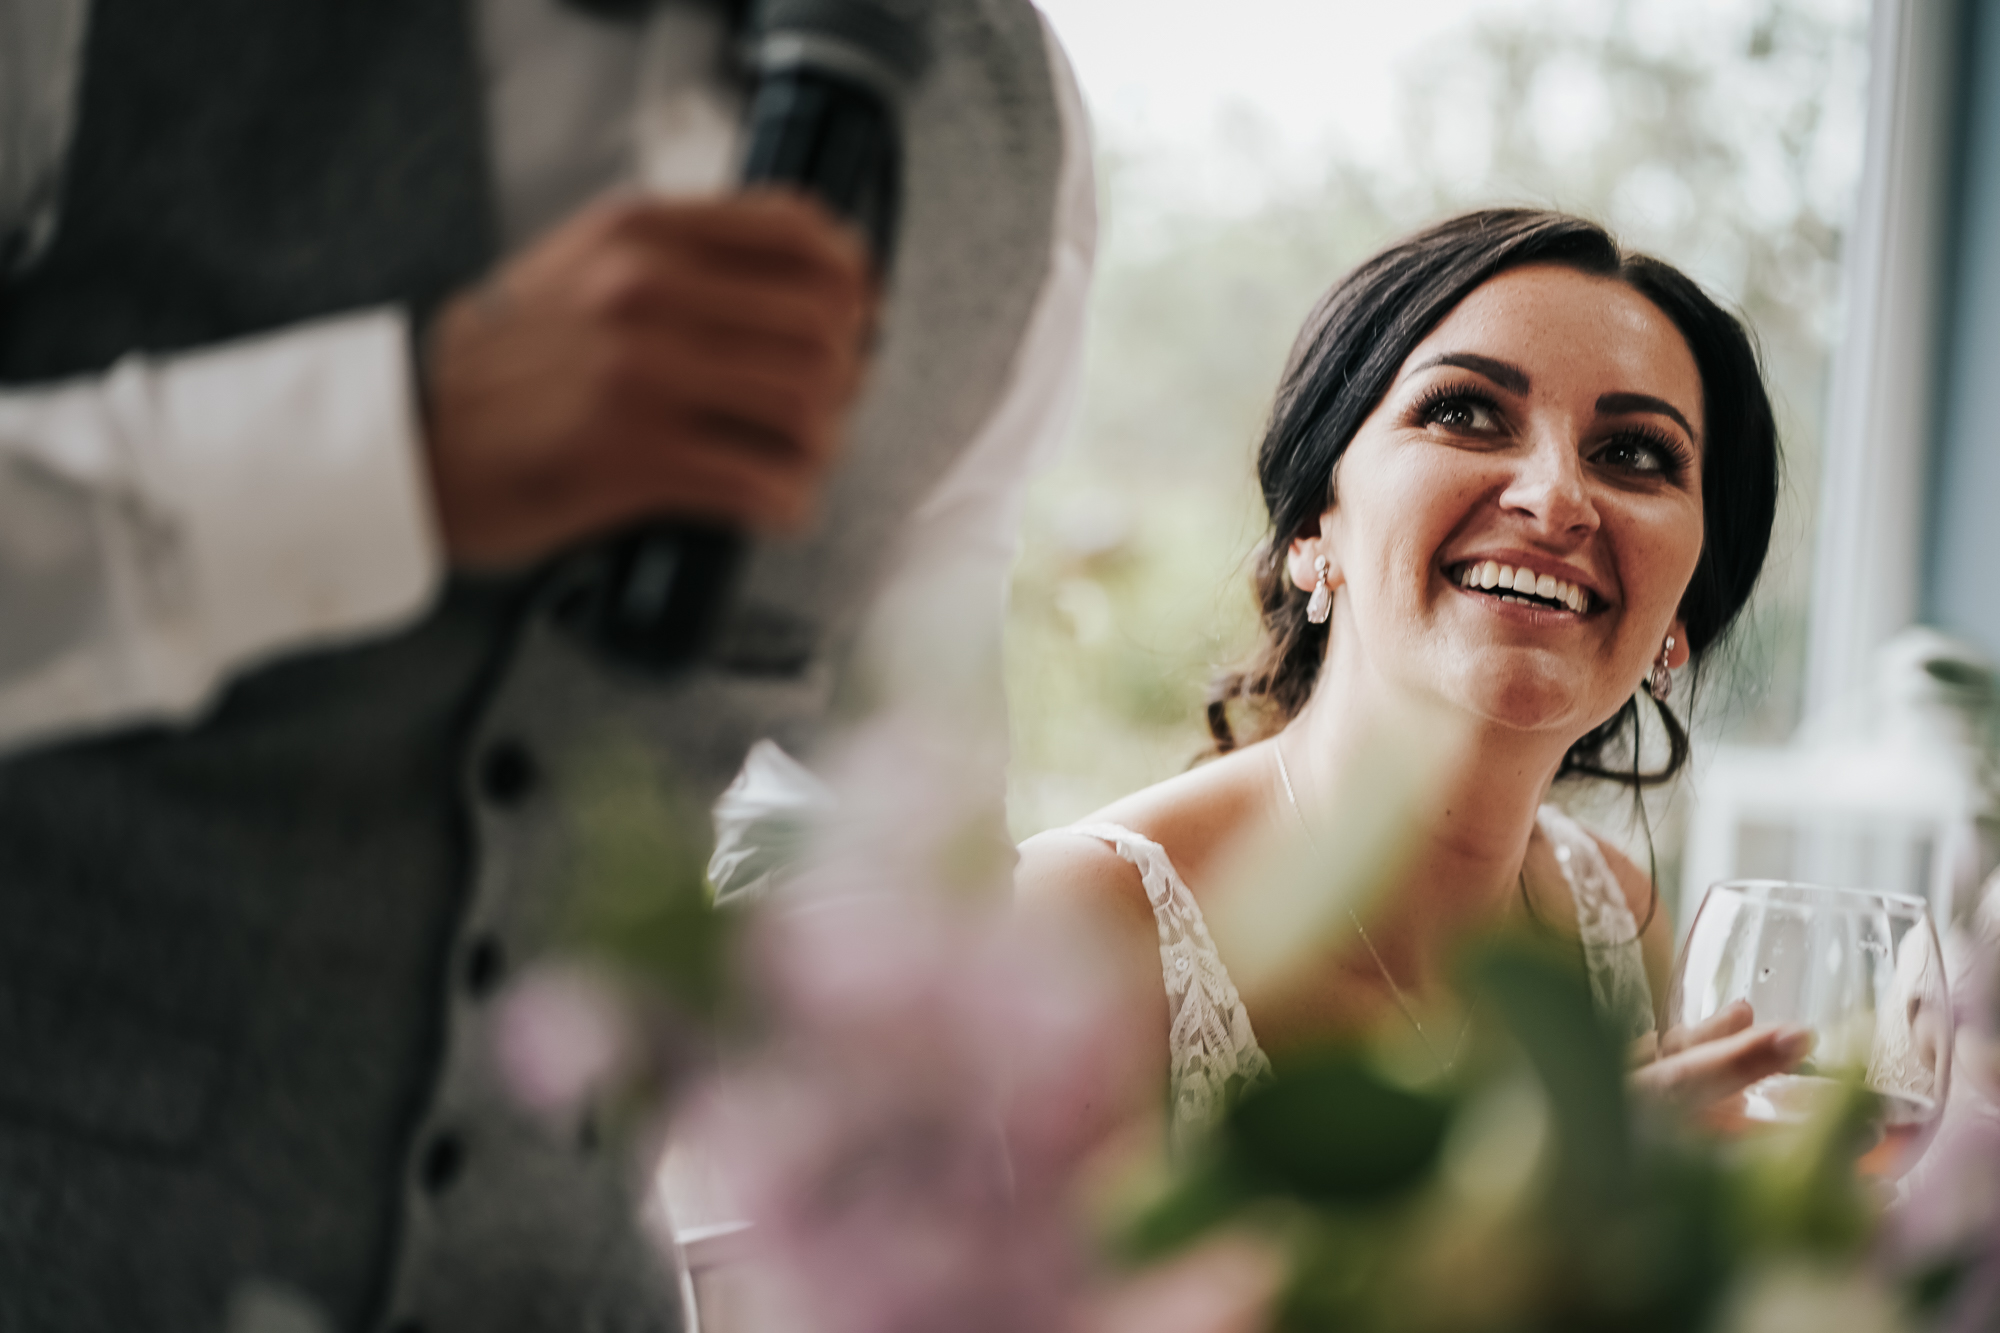 The Hayloft Wedding Photography Cheshire wedding photographer (43 of 52).jpg